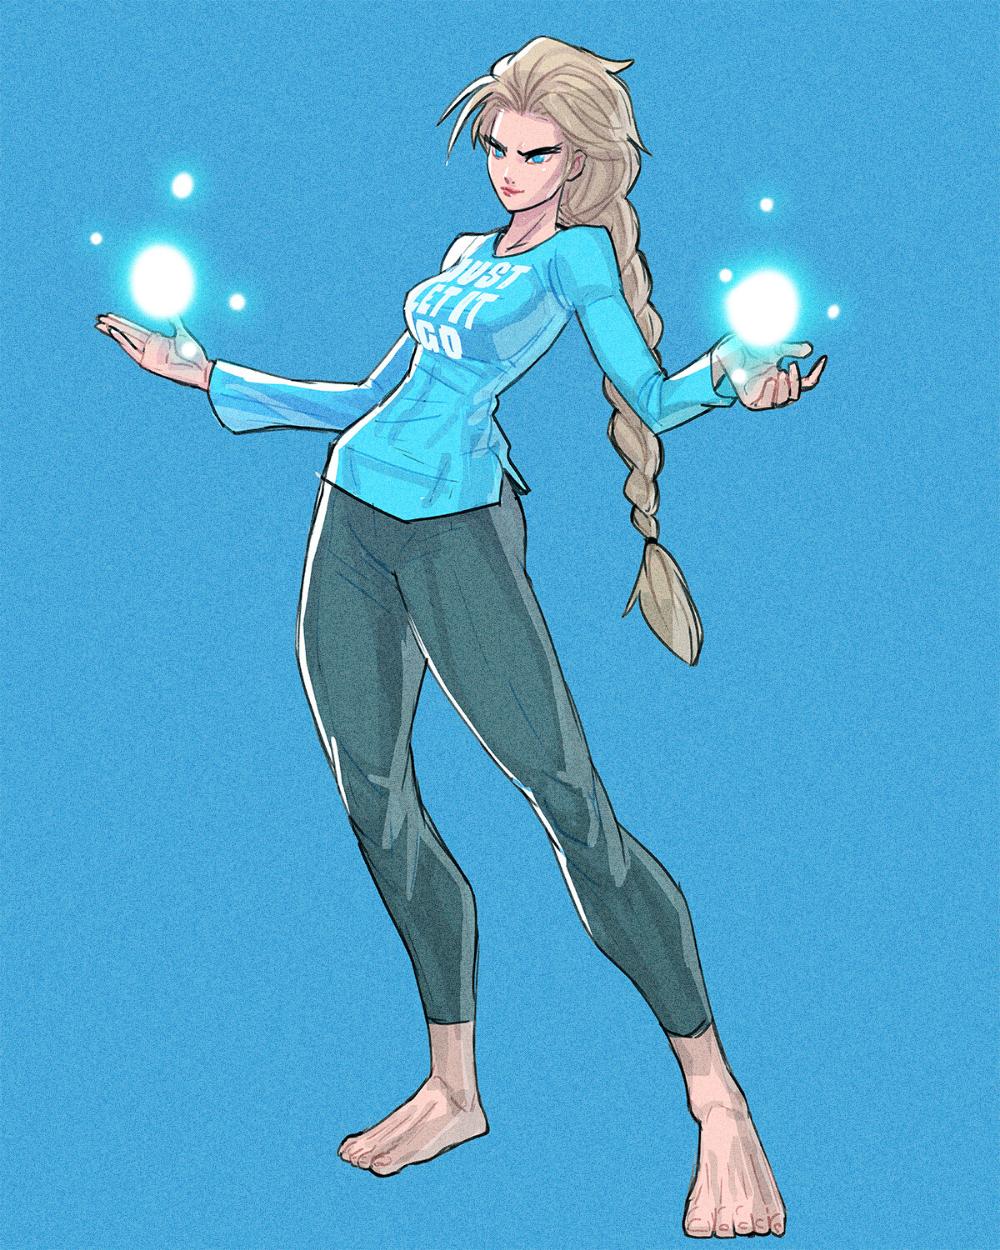 ArtStation Fighting Game Elsa , Dave CaveDraws